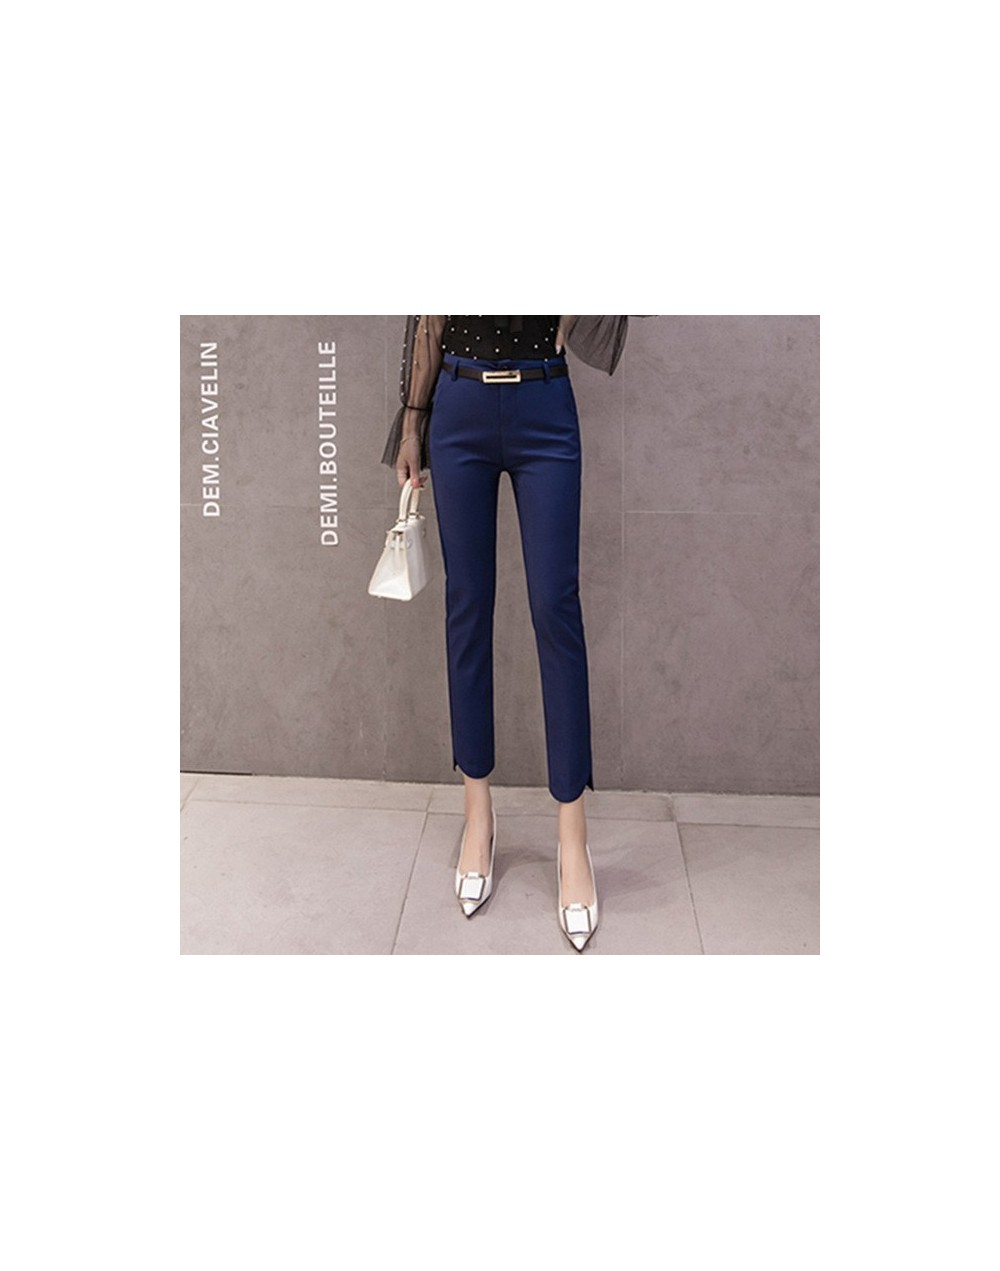 Black white blue women casual pants 2019 new autumn ladies pencil nine pants trousers office lady female feet pants - 5405Na...